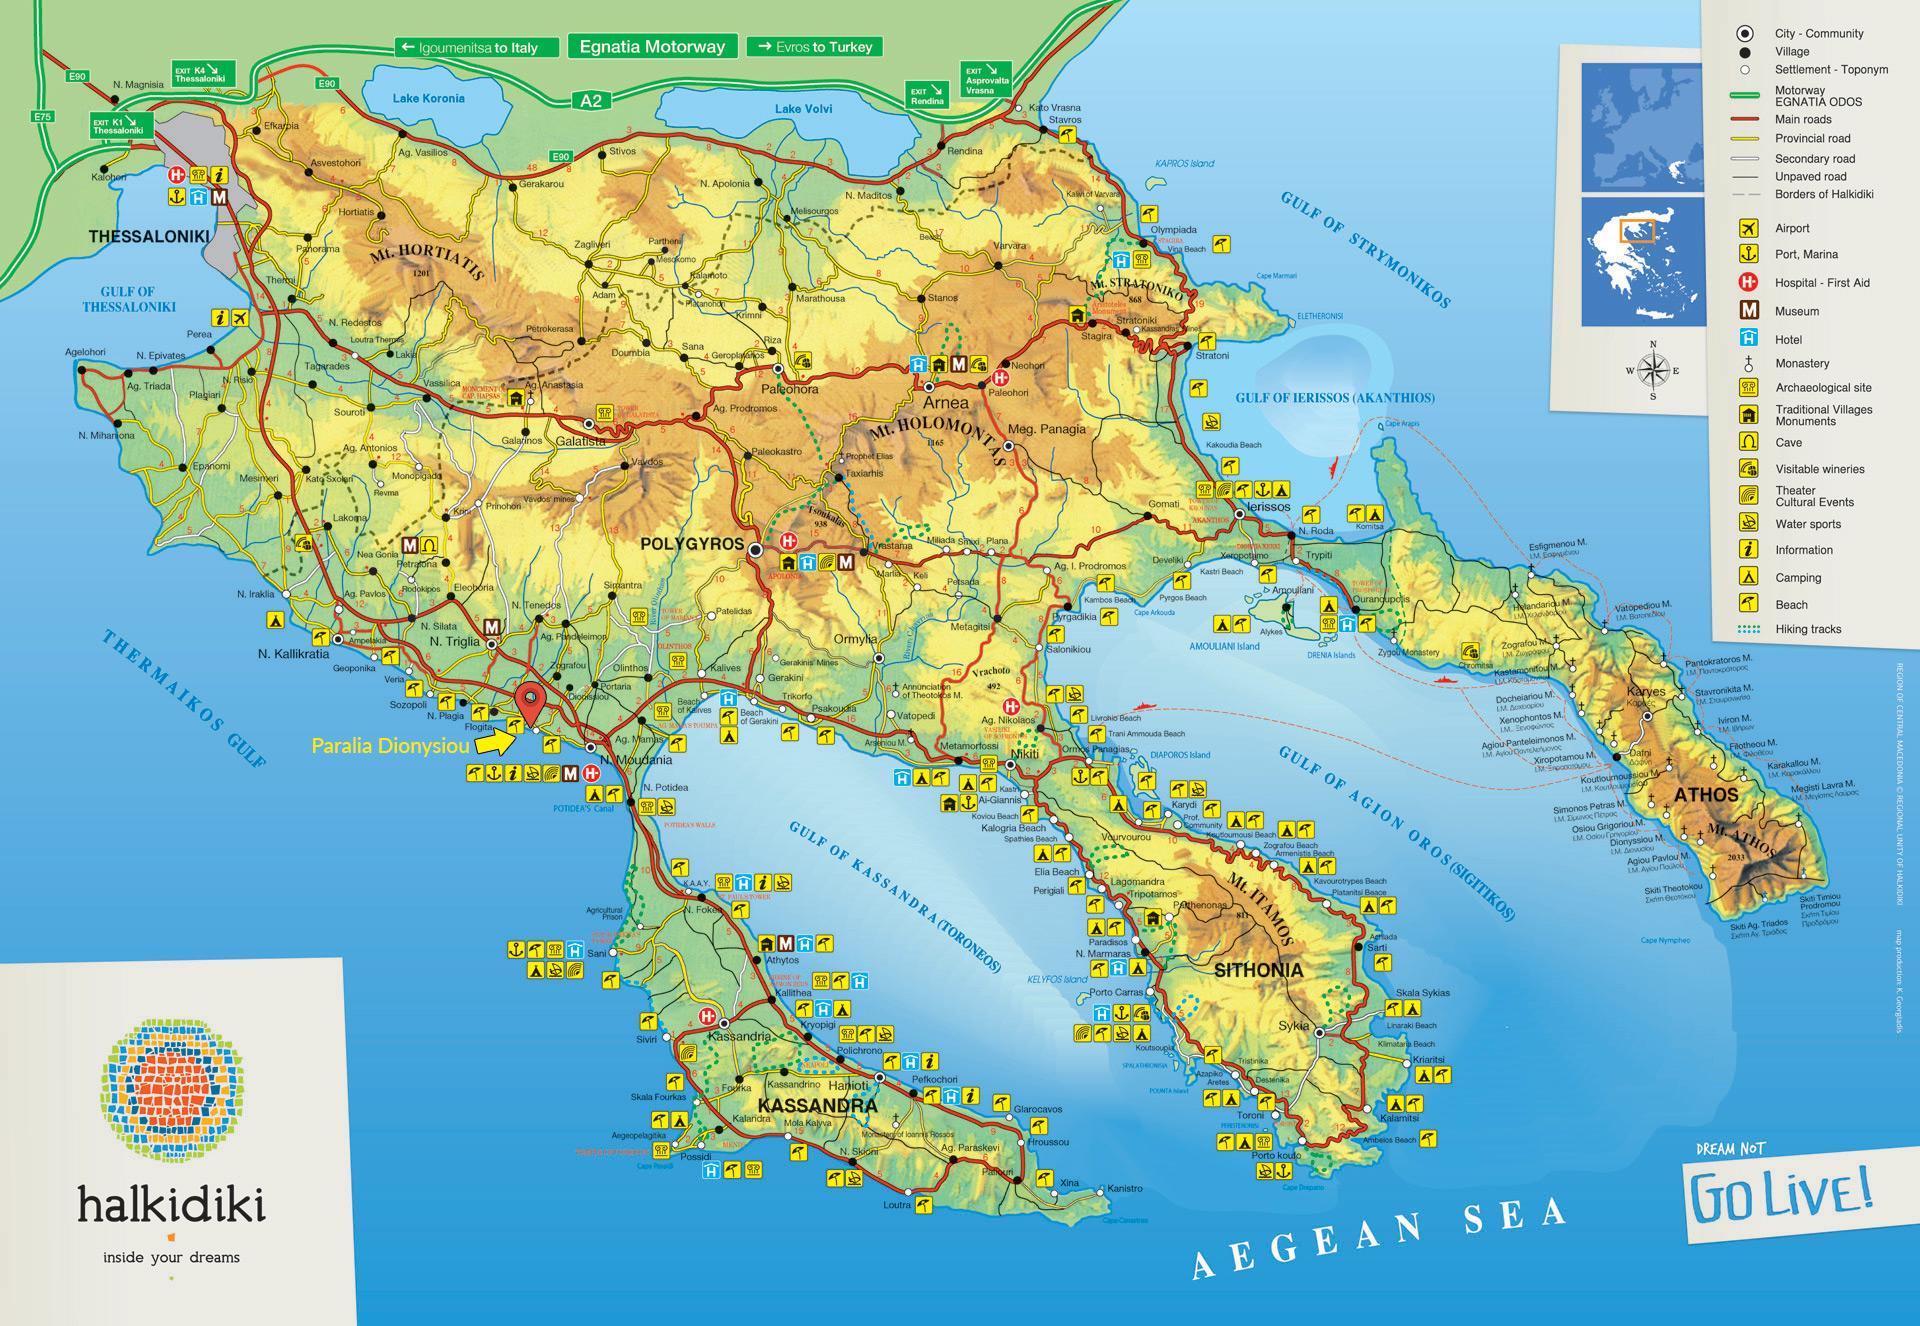 Apartments Dimitra Location Halkidiki and surrounding area